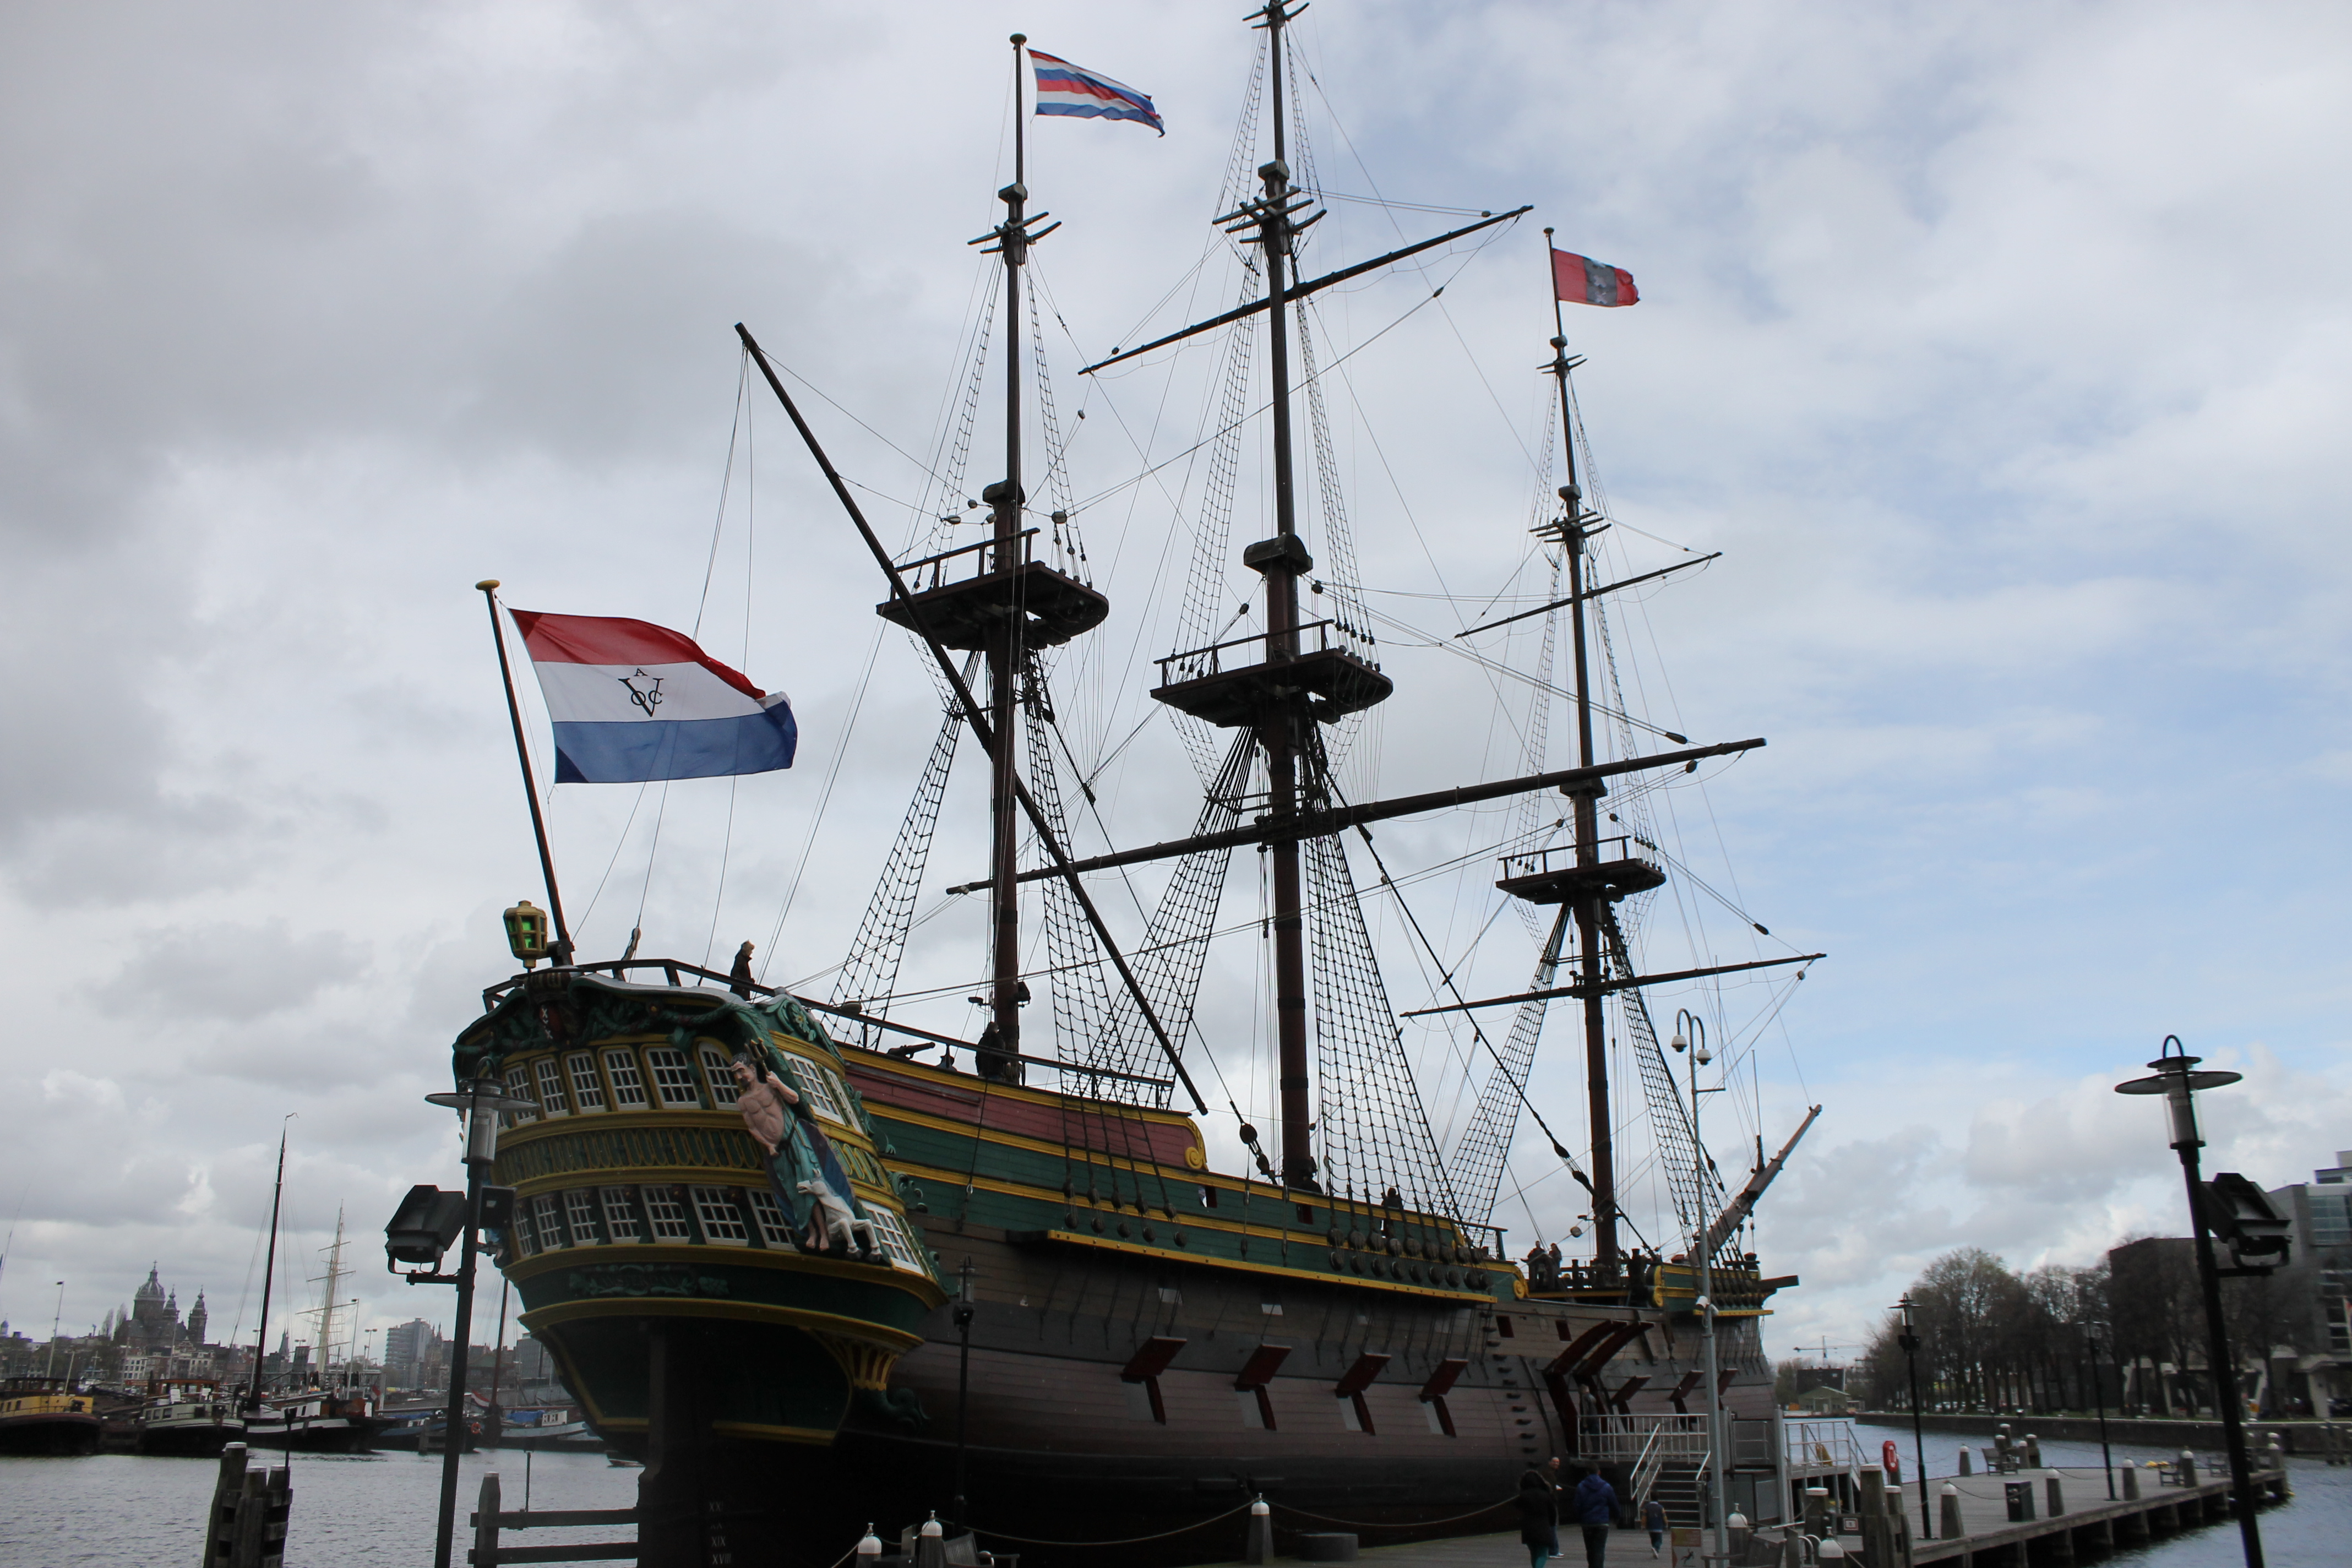 Kumpulan Gambar Sketsa Bentuk Bentuk Kapal Kargo Belanda